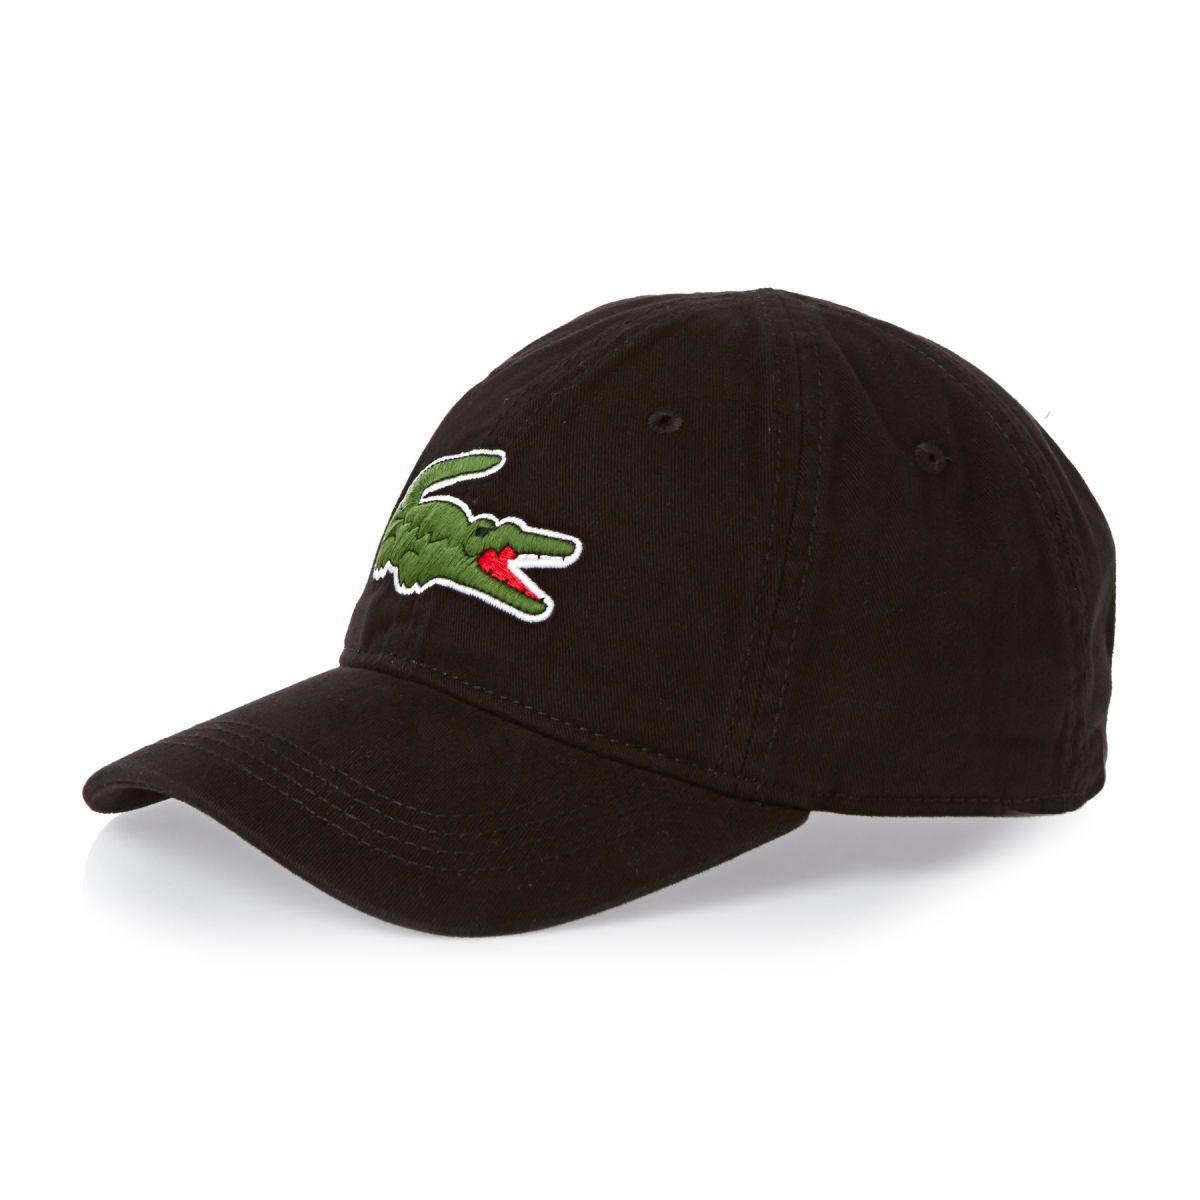 ddae103b84 achat de casquette lacoste,casquette lacoste blanche